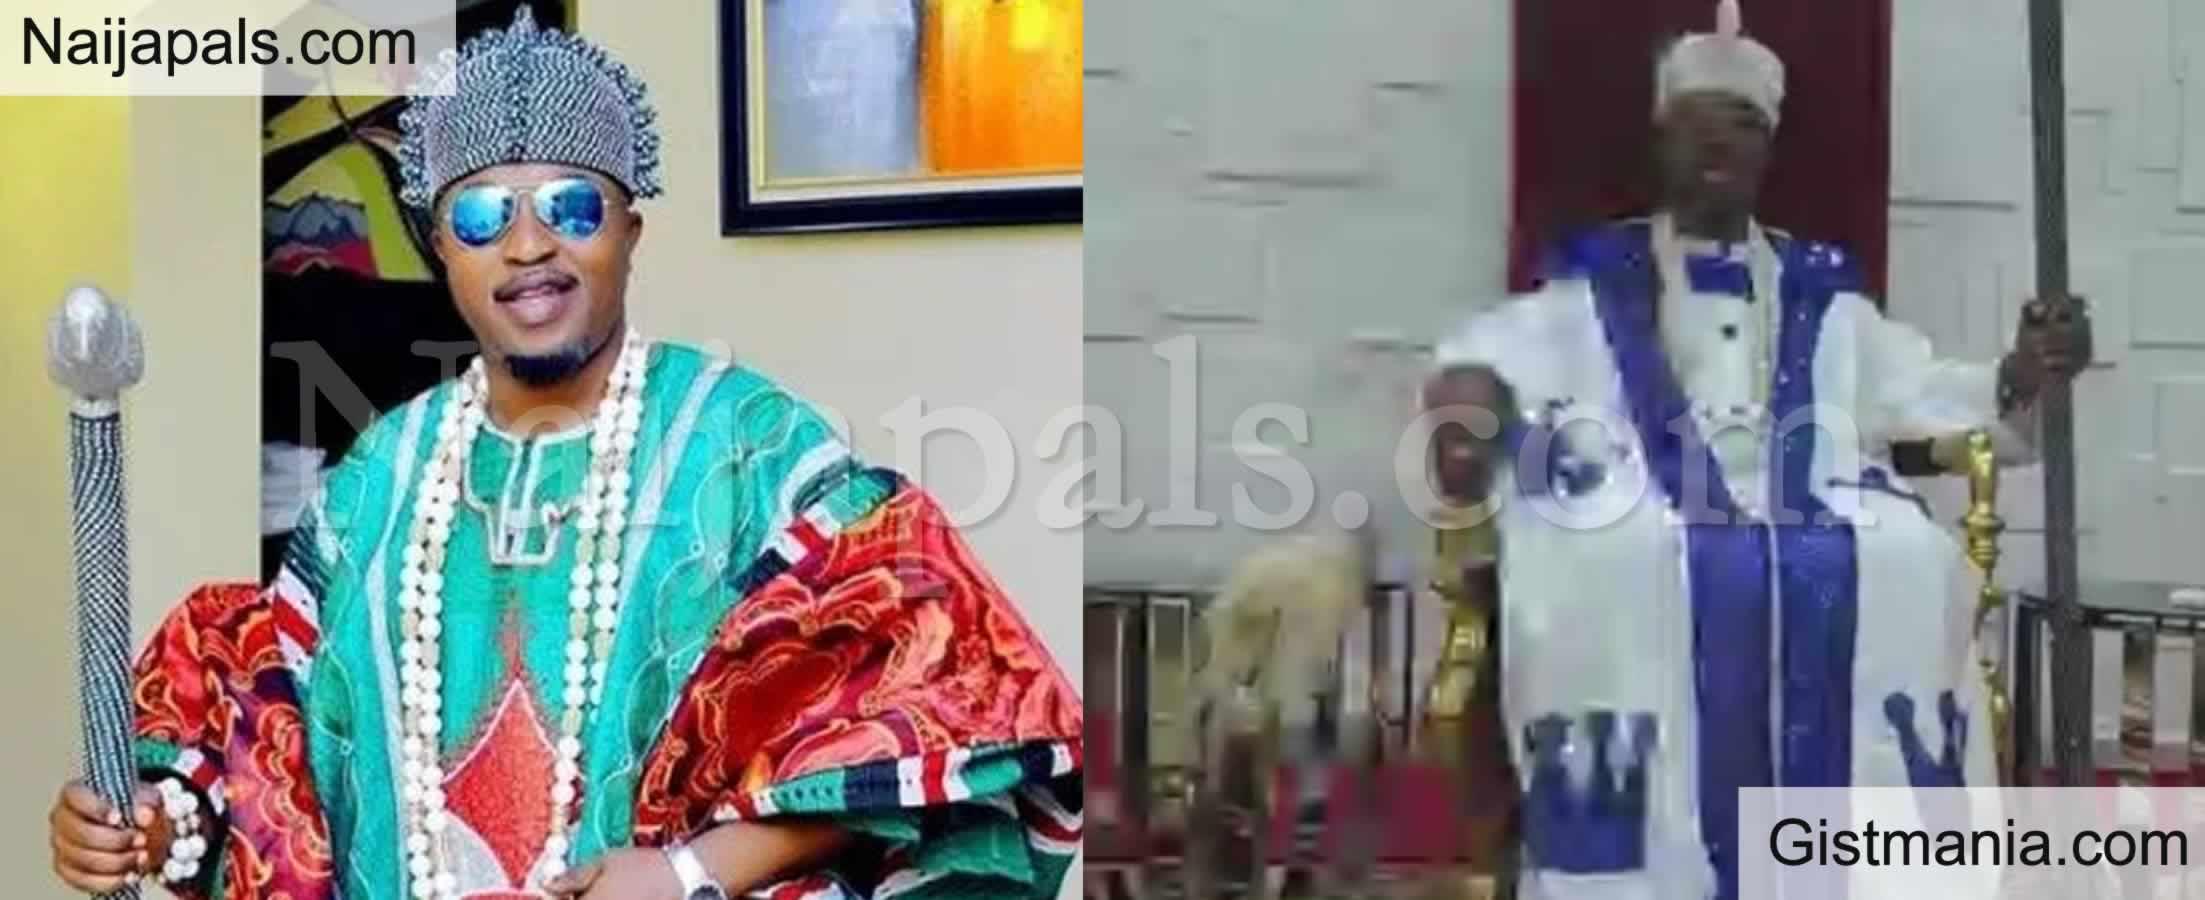 <img alt='.' class='lazyload' data-src='https://img.gistmania.com/emot/comment.gif' /> <b>Family Planning in Nigeria Will Soon Wipe Out Human Race</b> - Oluwo of Iwo, Oba Akanbi